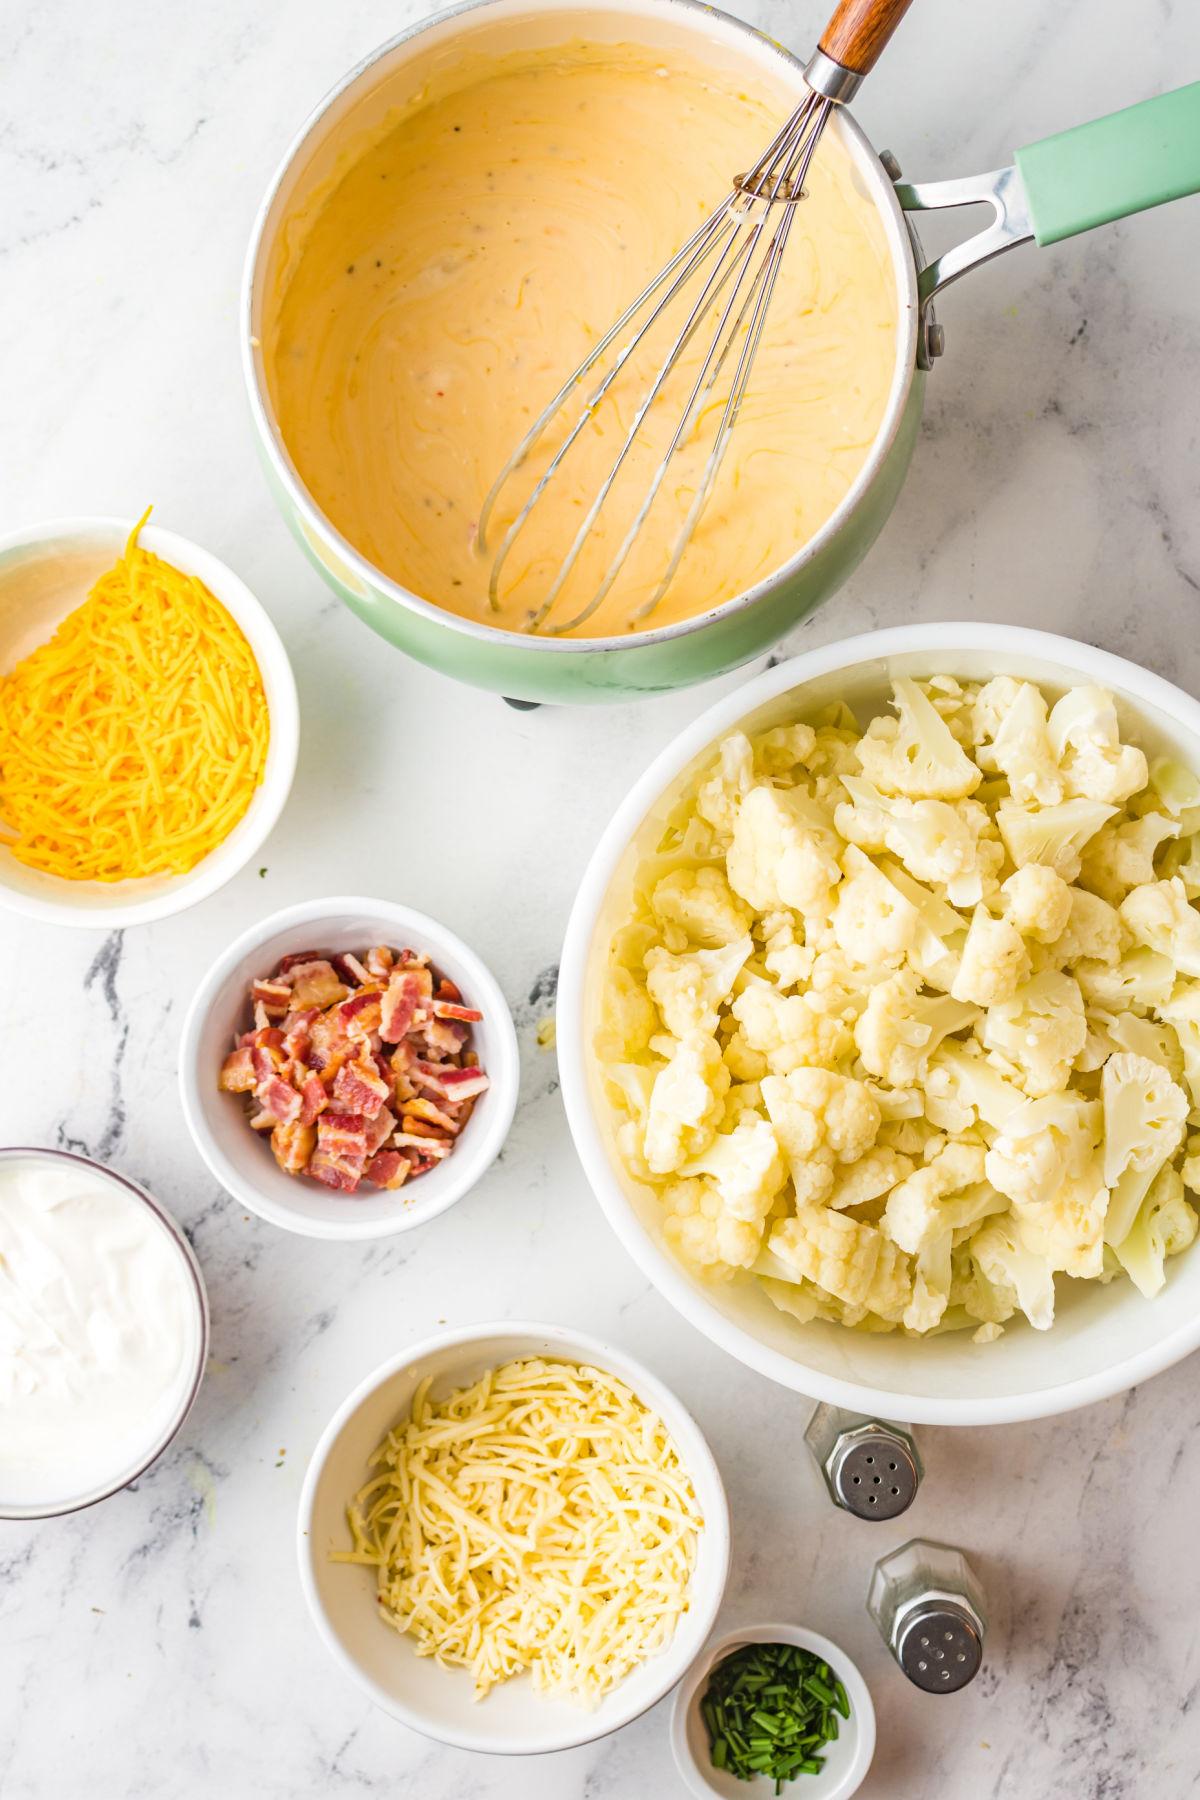 Cheese sauce prepared for cauliflower casserole.